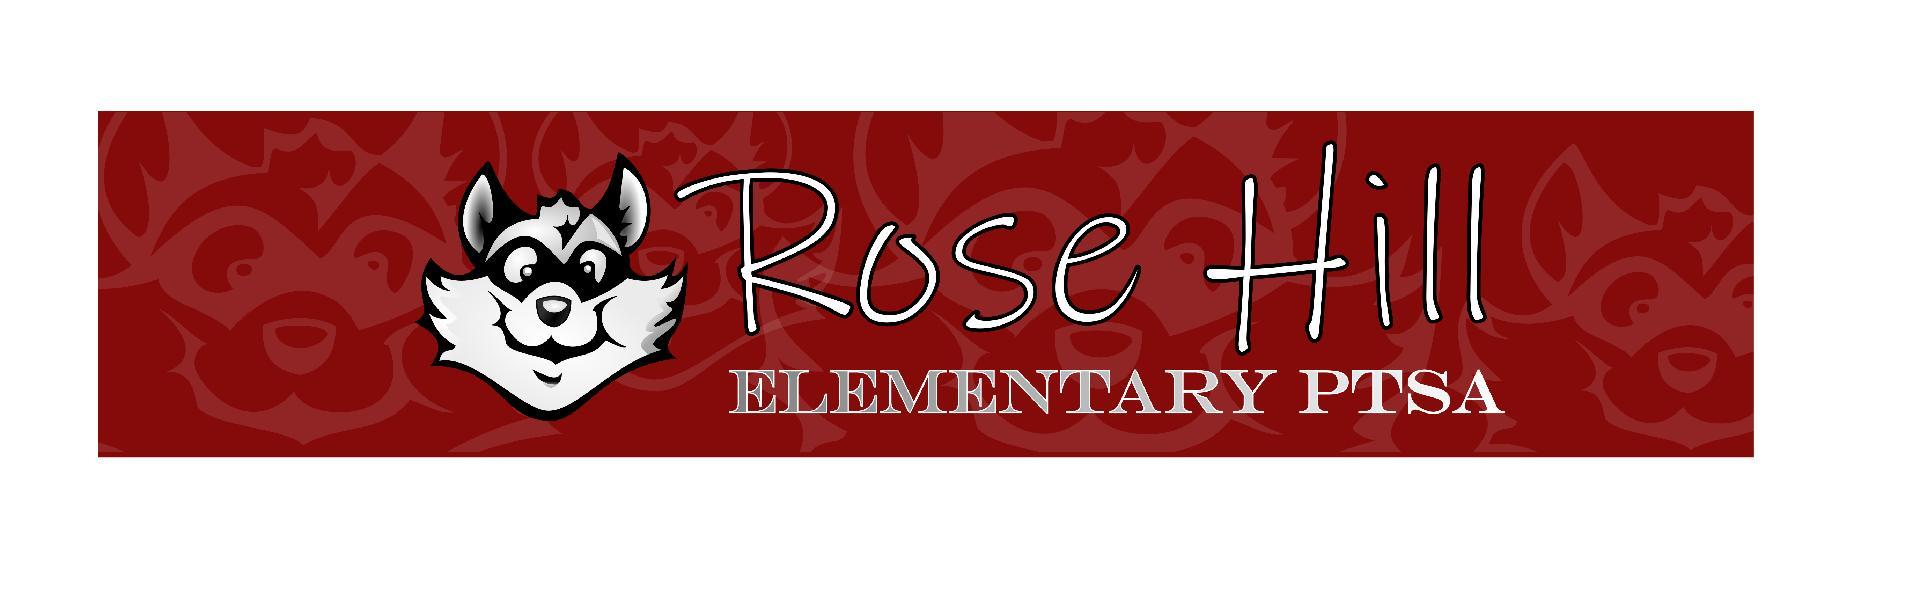 Rose Hill Elementary PTSA